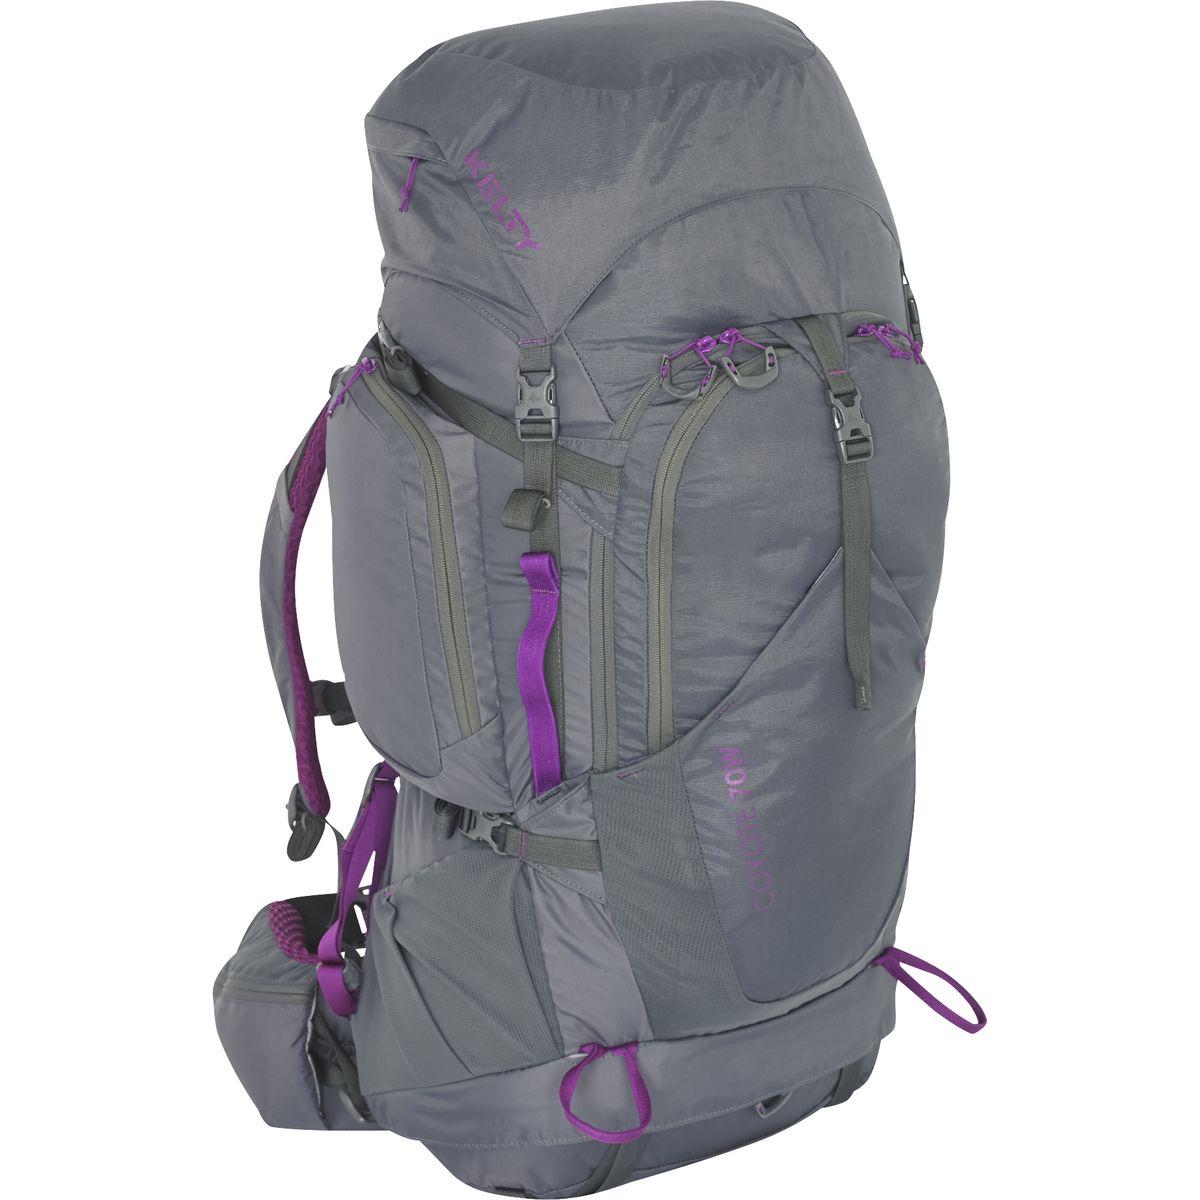 Kelty-Coyote-70L-Backpack-Women-039-s